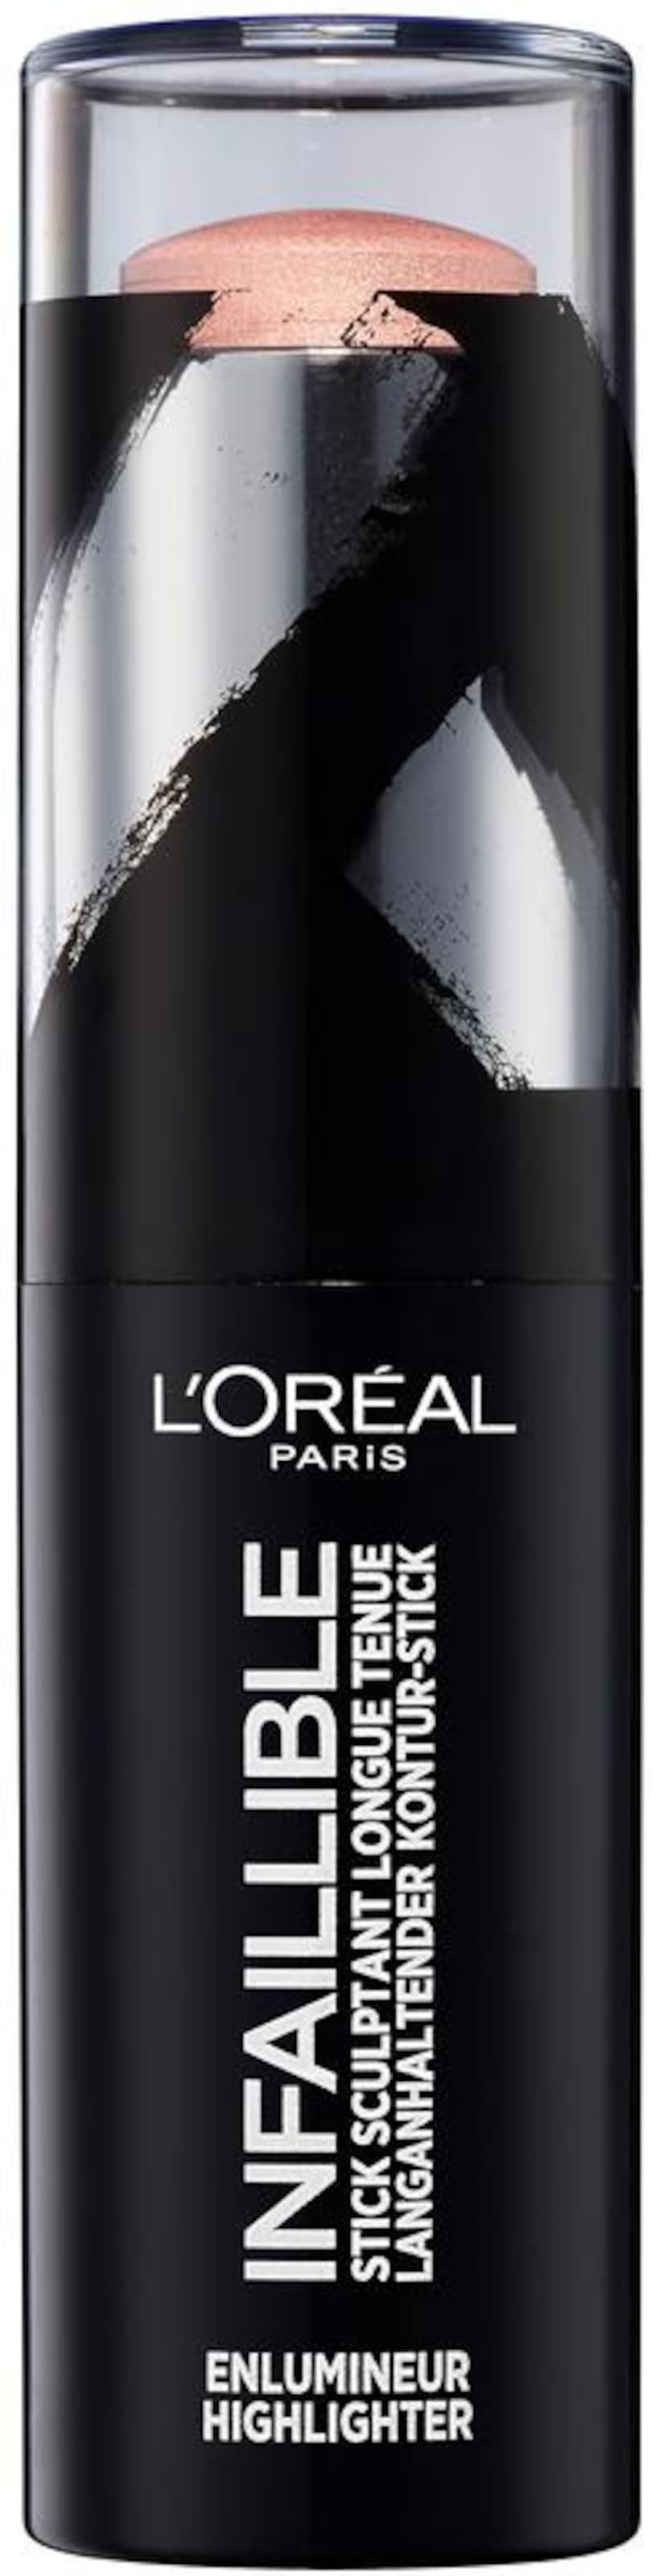 L'Oréal Paris HIGHL.INFSTICK 503 Footlocker Finish Günstig Online QWBHw